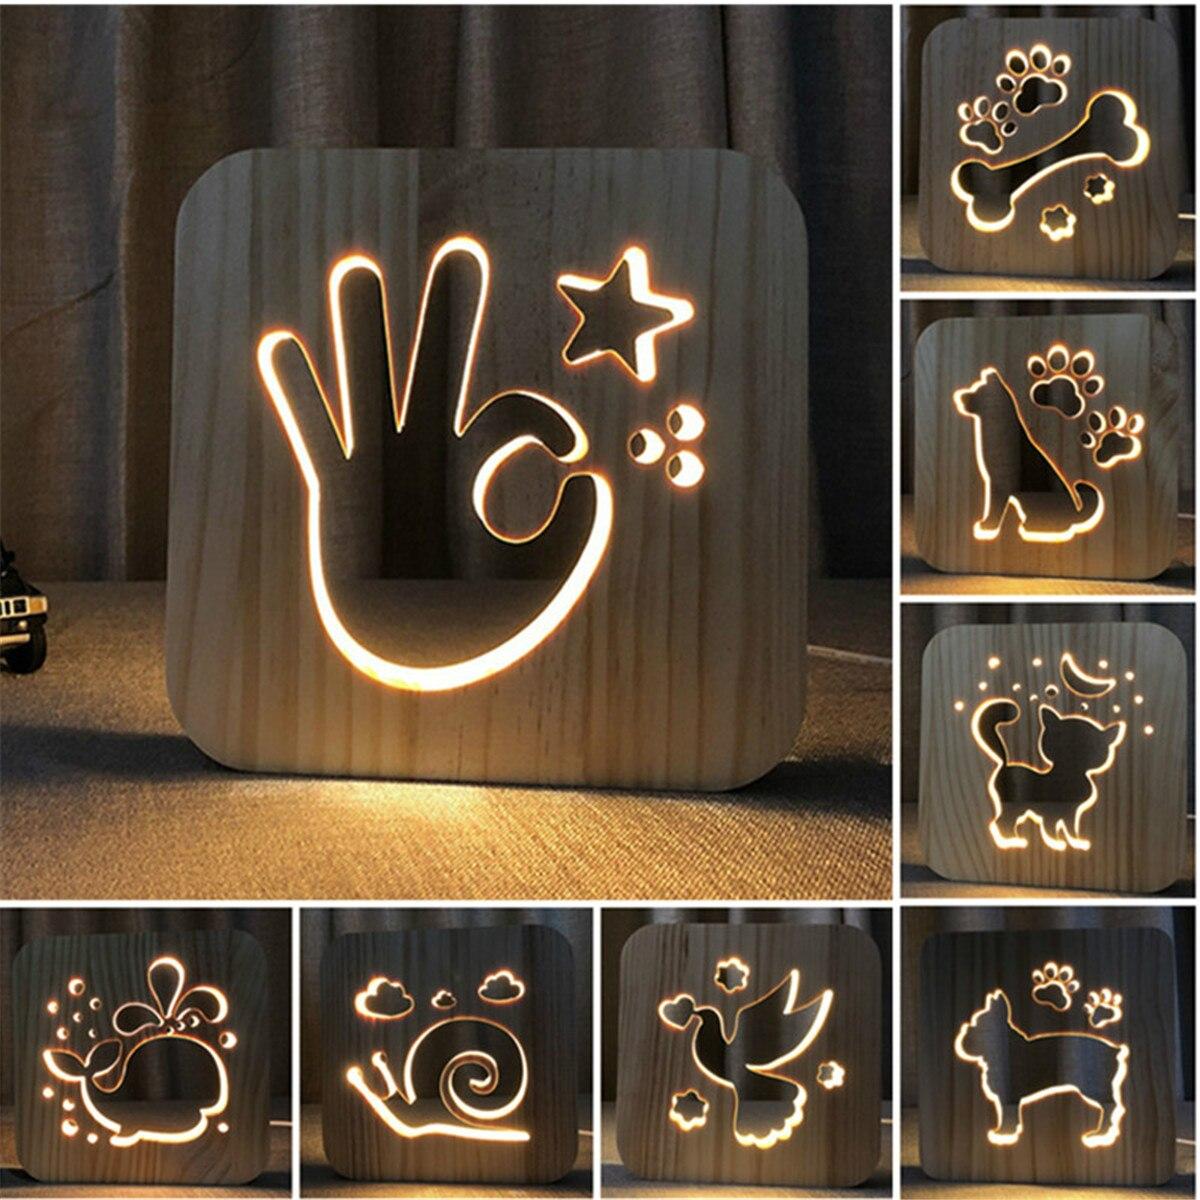 3D USB LED Table Light Wood Desk Lamps Dog Paw Cat Wolf Animal Lamp Novelty Kids Bedroom 3D Decoration Table Light Children Gift